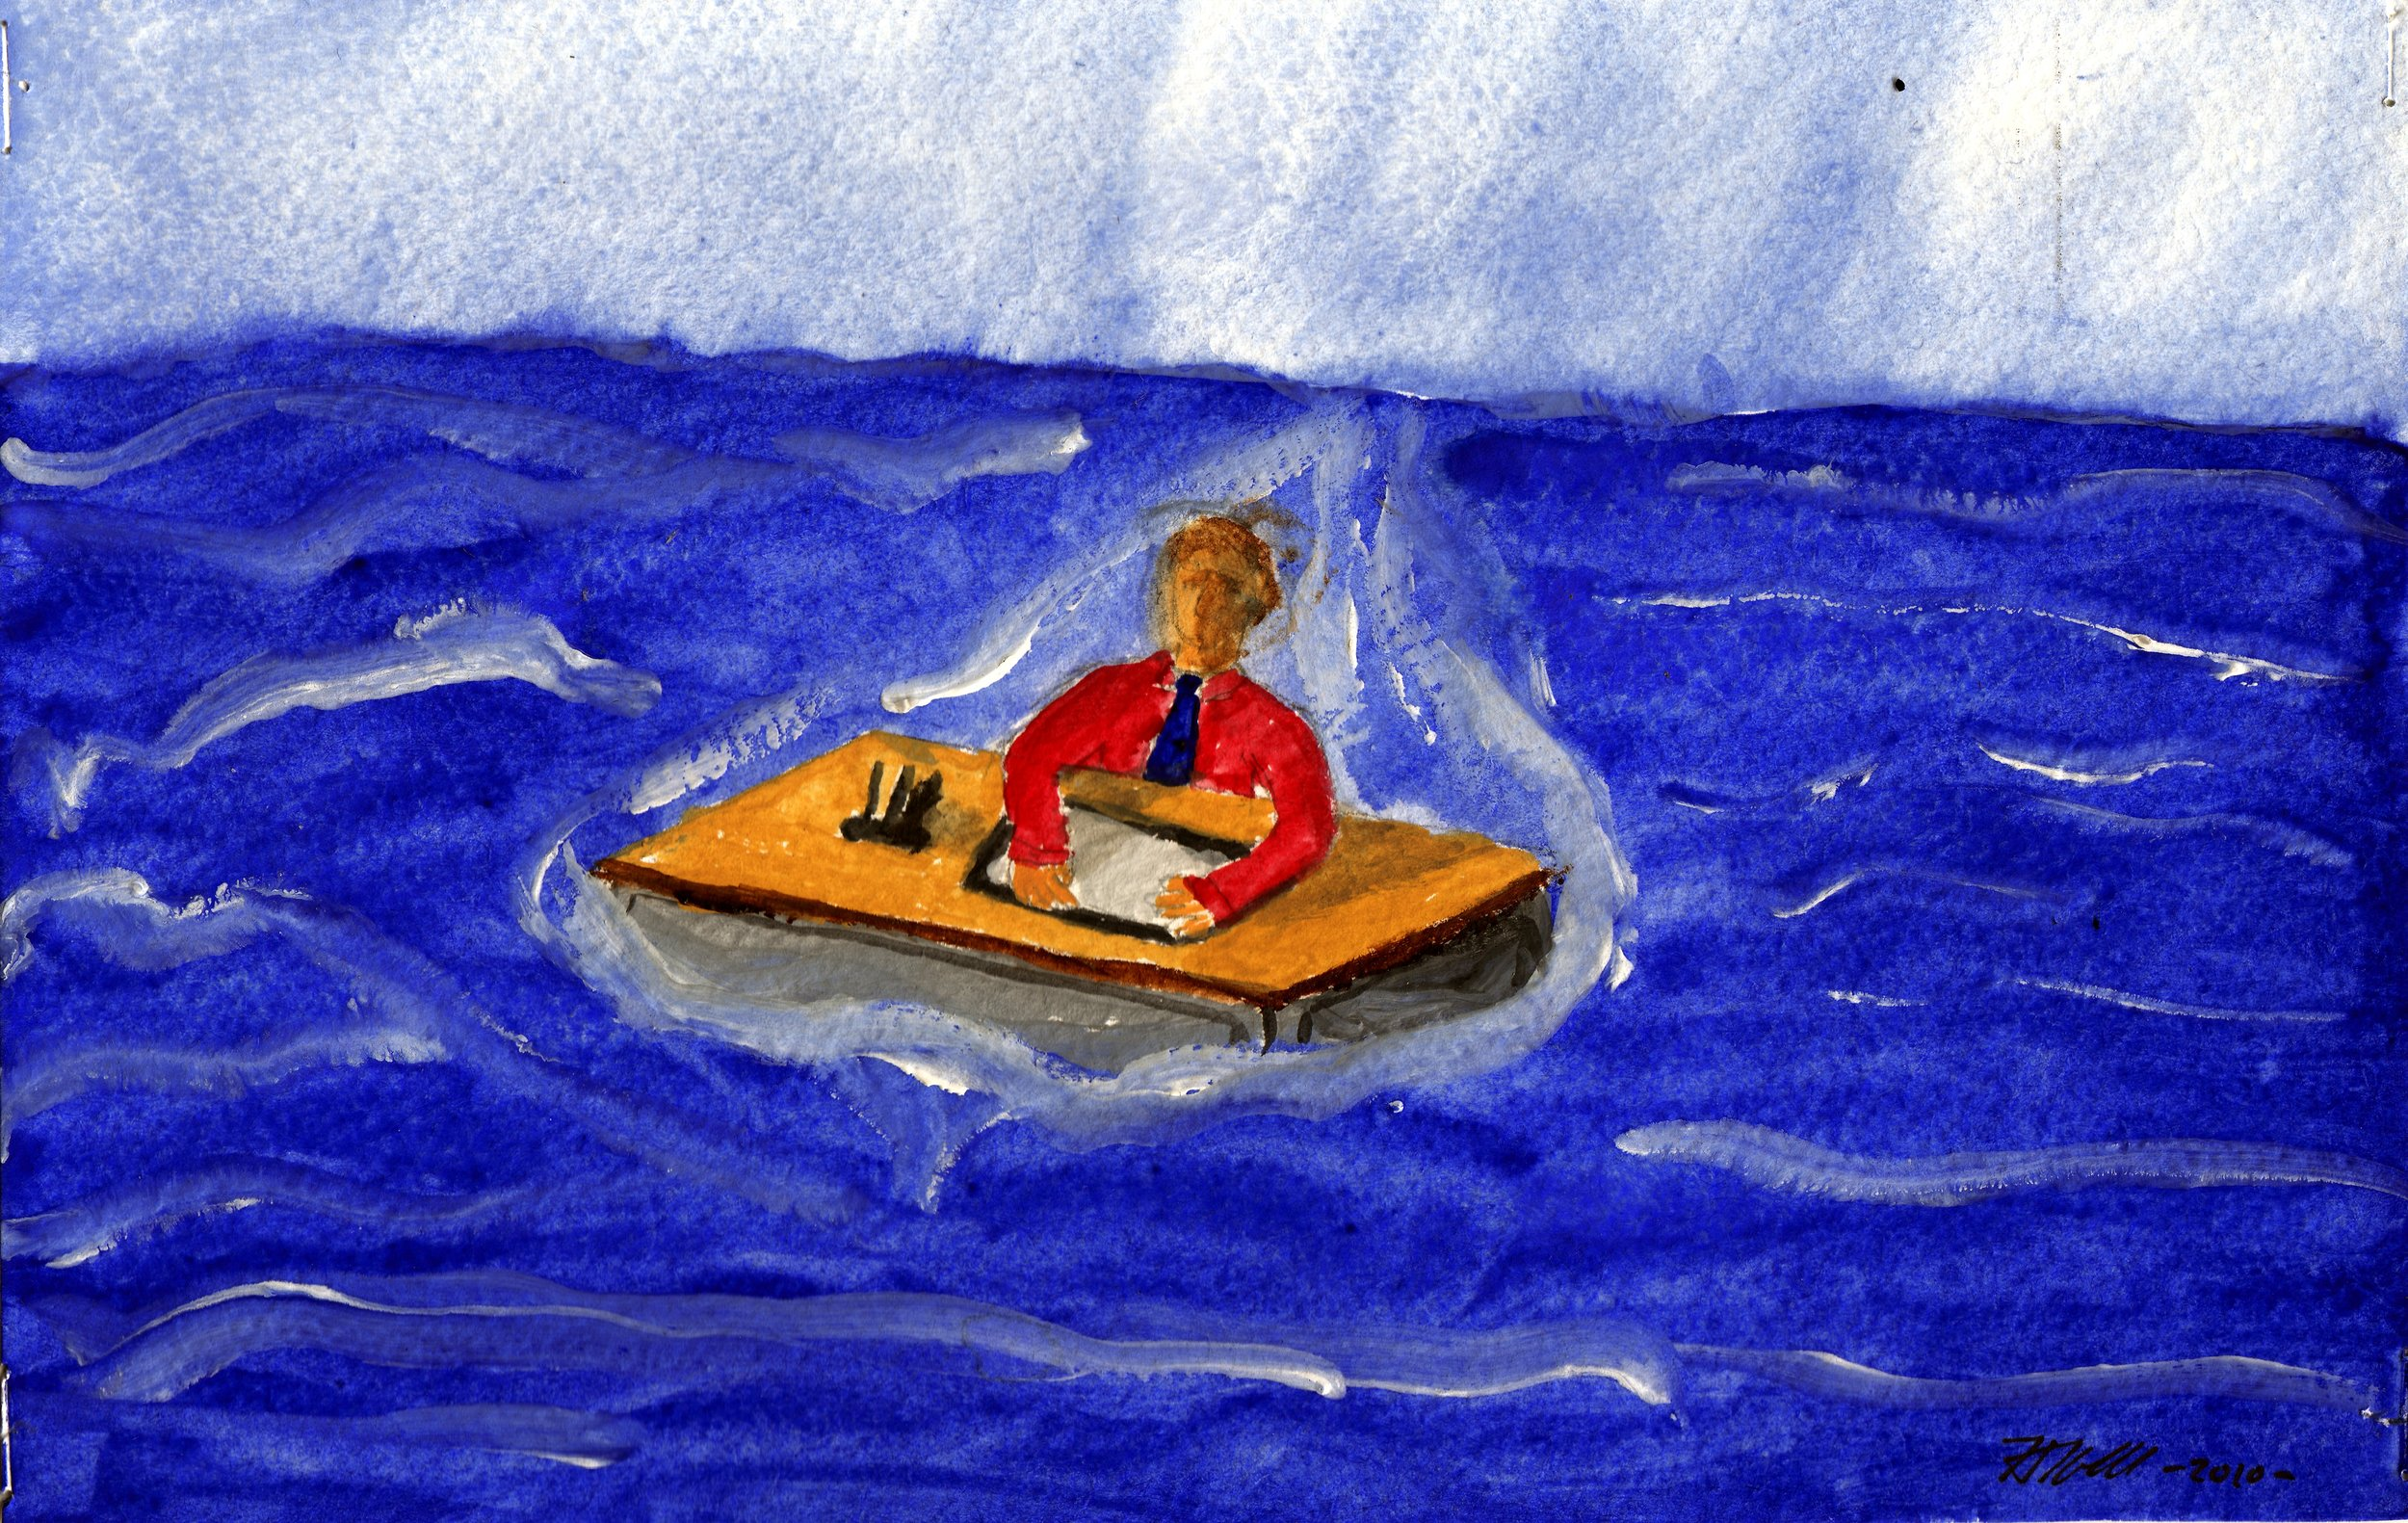 Deskboat.jpg